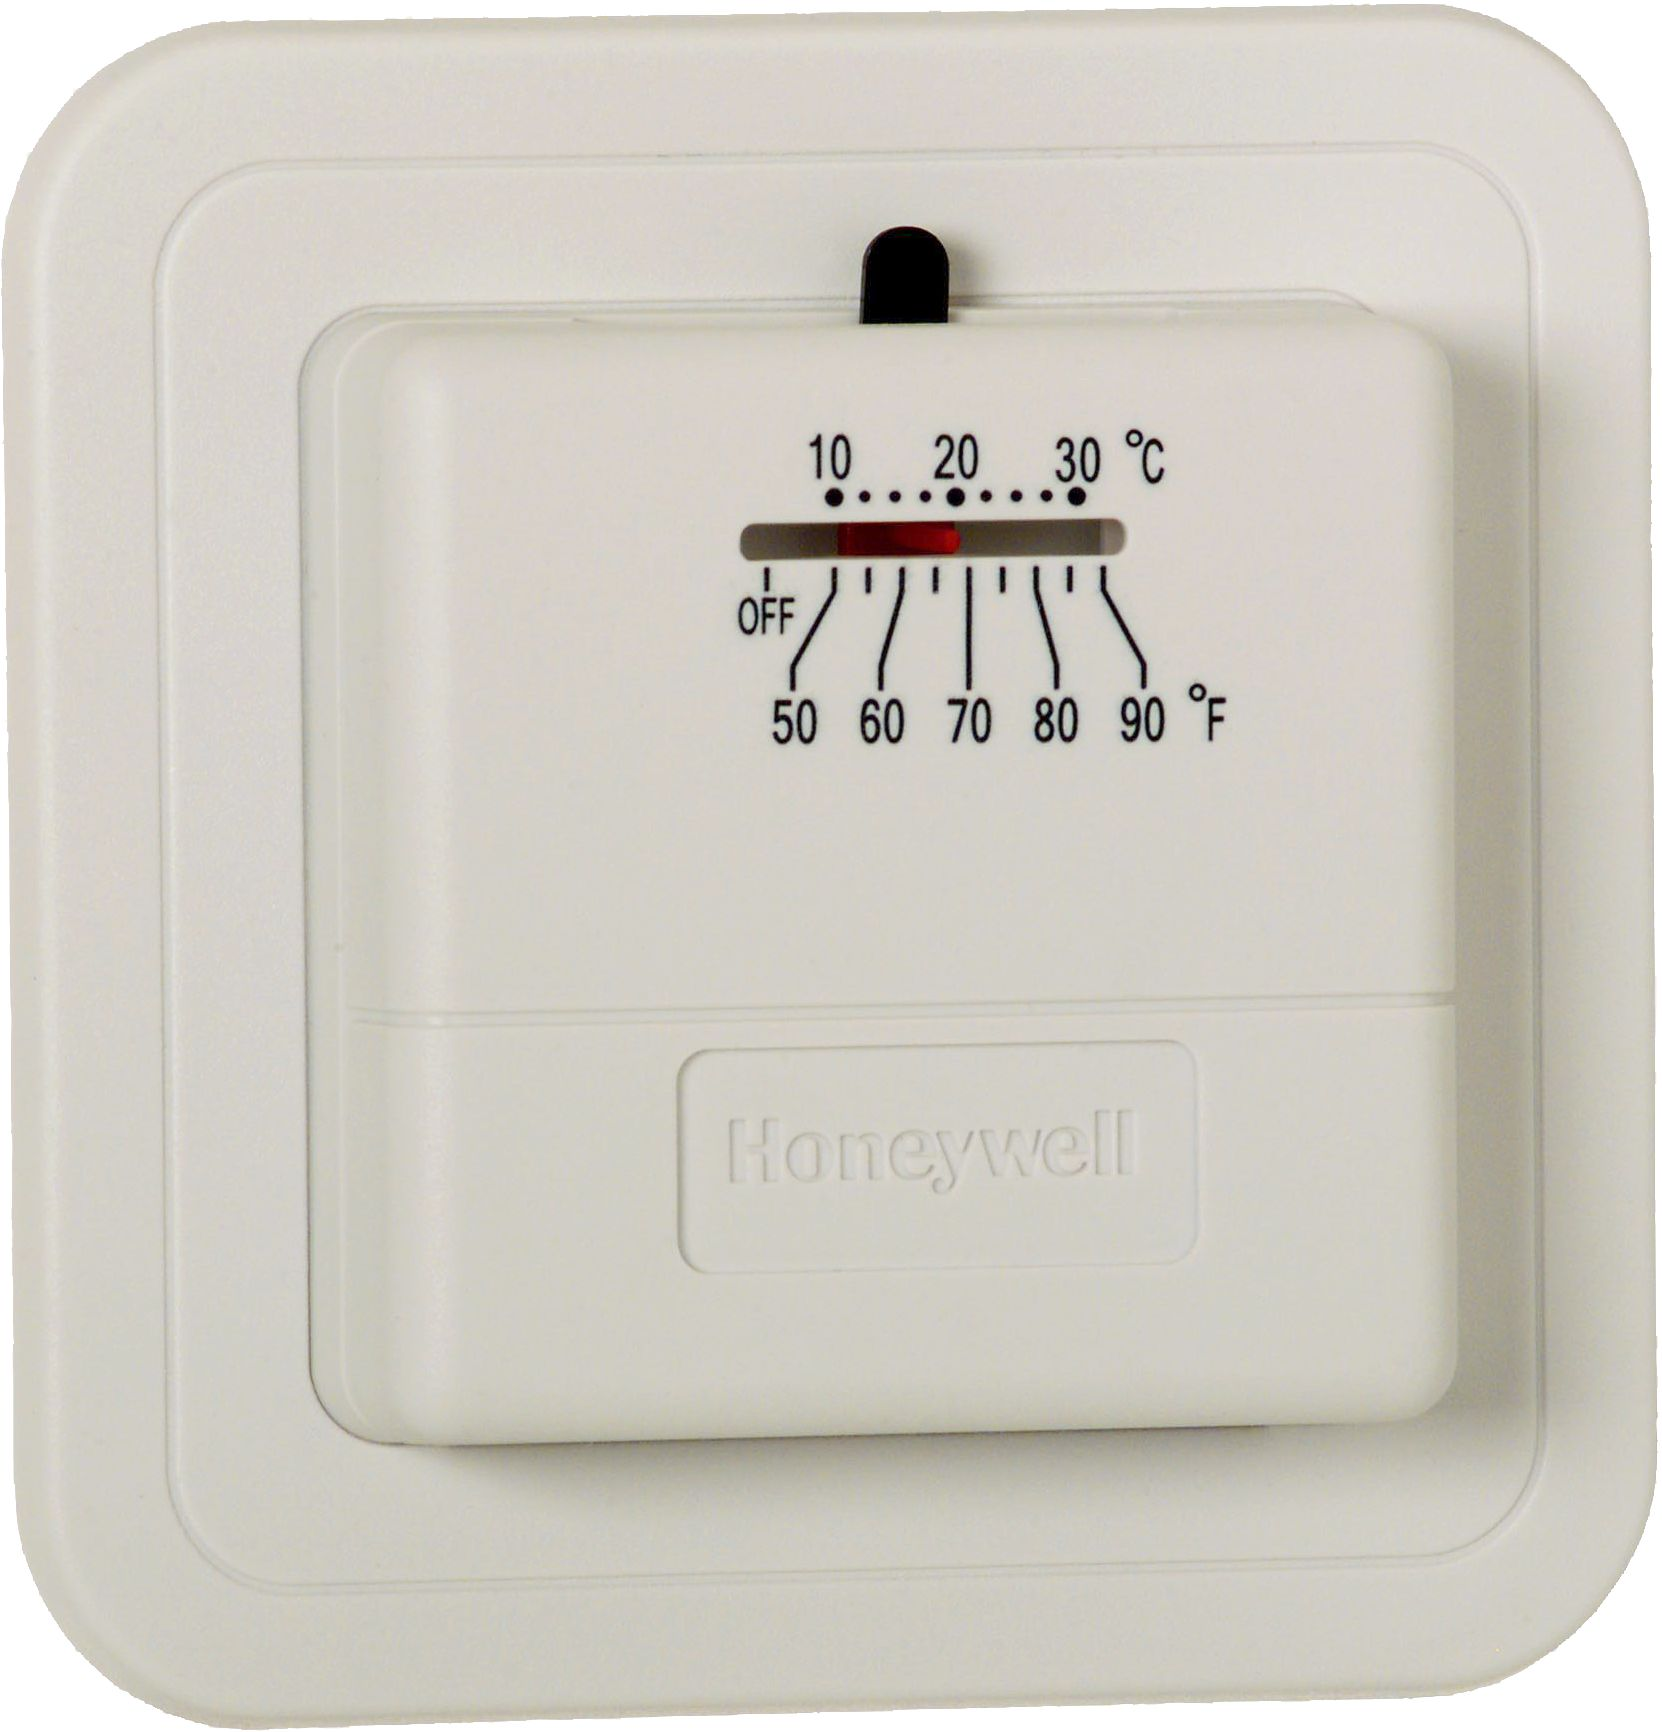 Honeywell CT30A